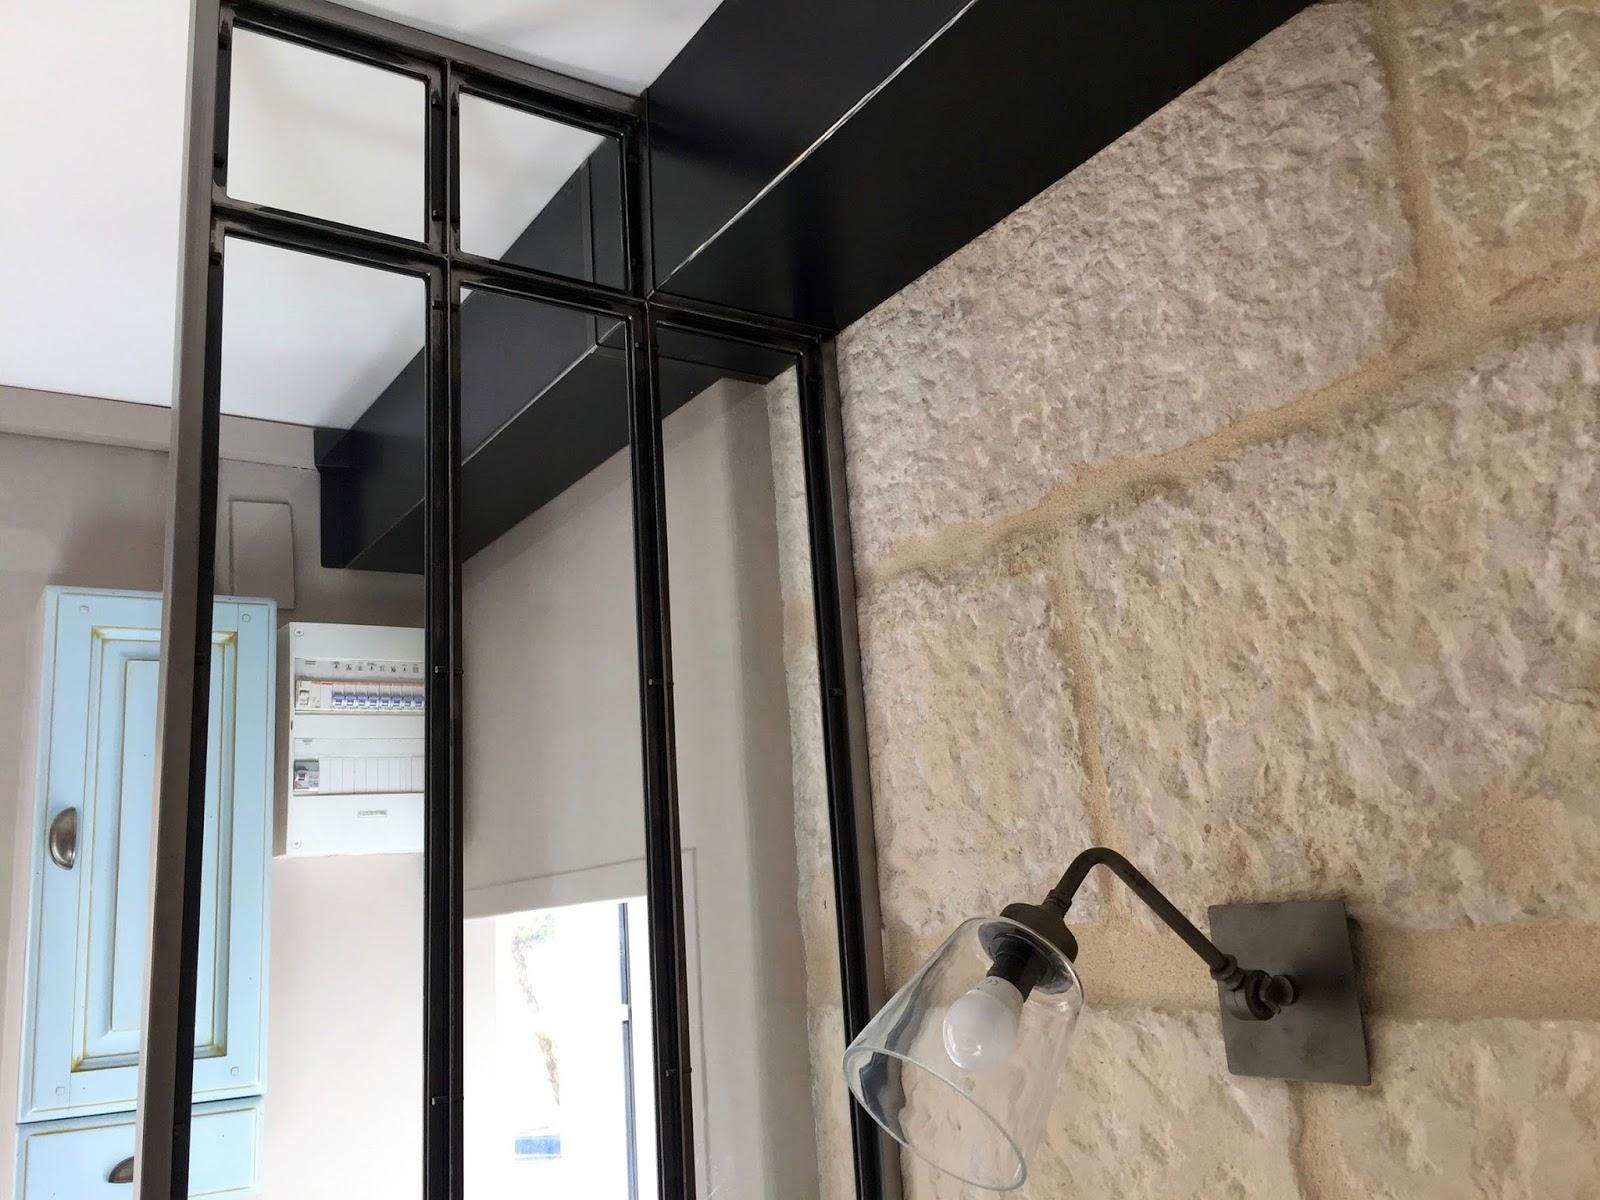 ferronnerie m tallerie serrurerie 79 deux s vres l 39 art du fer play fen tre verri re fixe 3. Black Bedroom Furniture Sets. Home Design Ideas